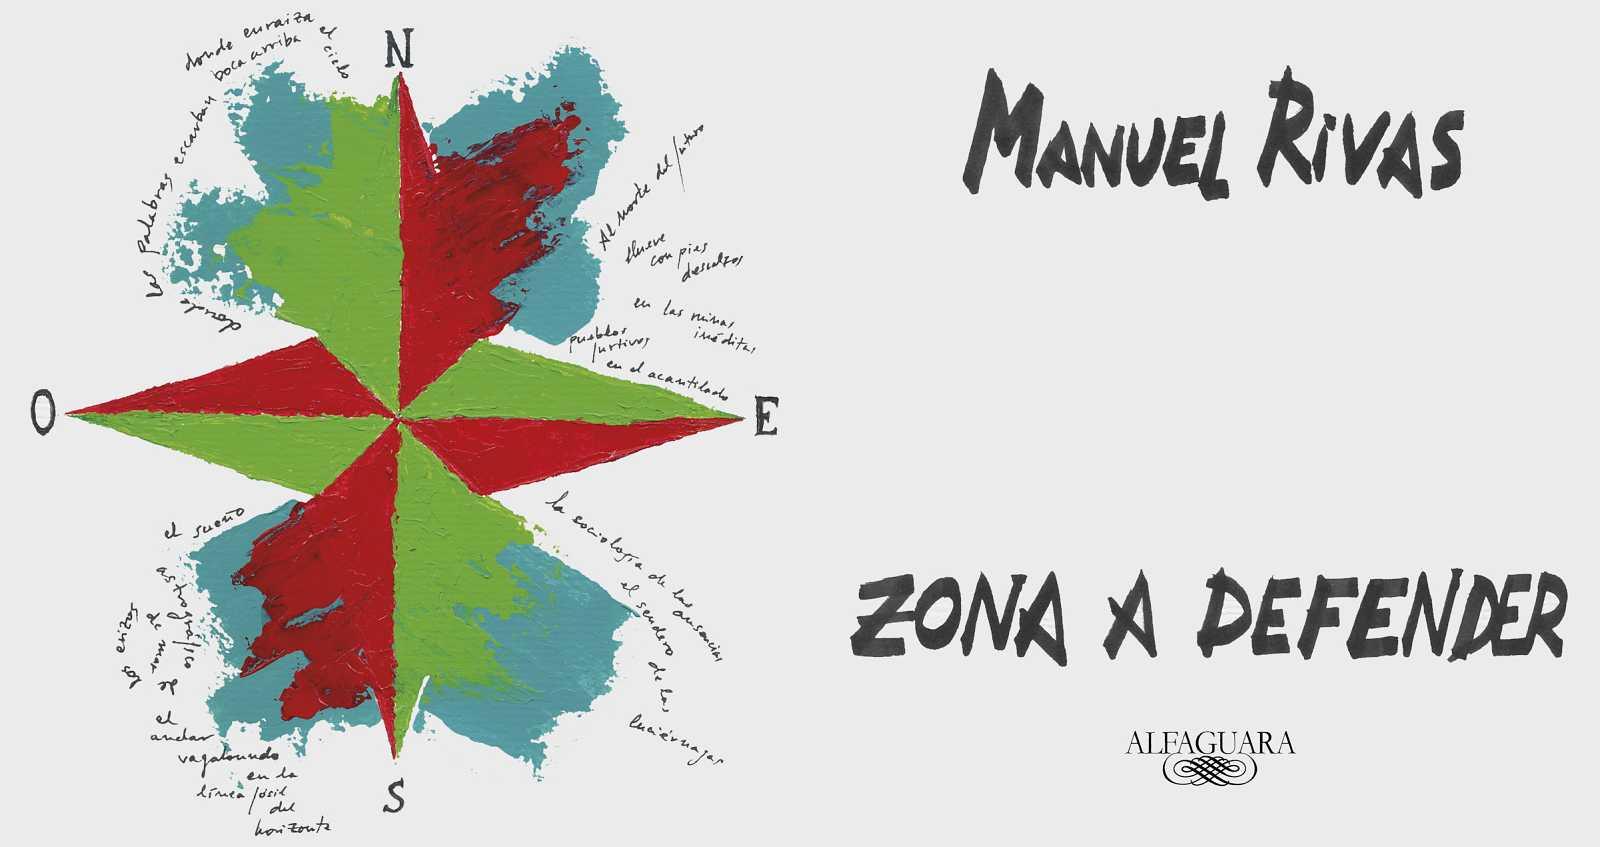 Wonderland - Manuel Rivas: Zona a defender